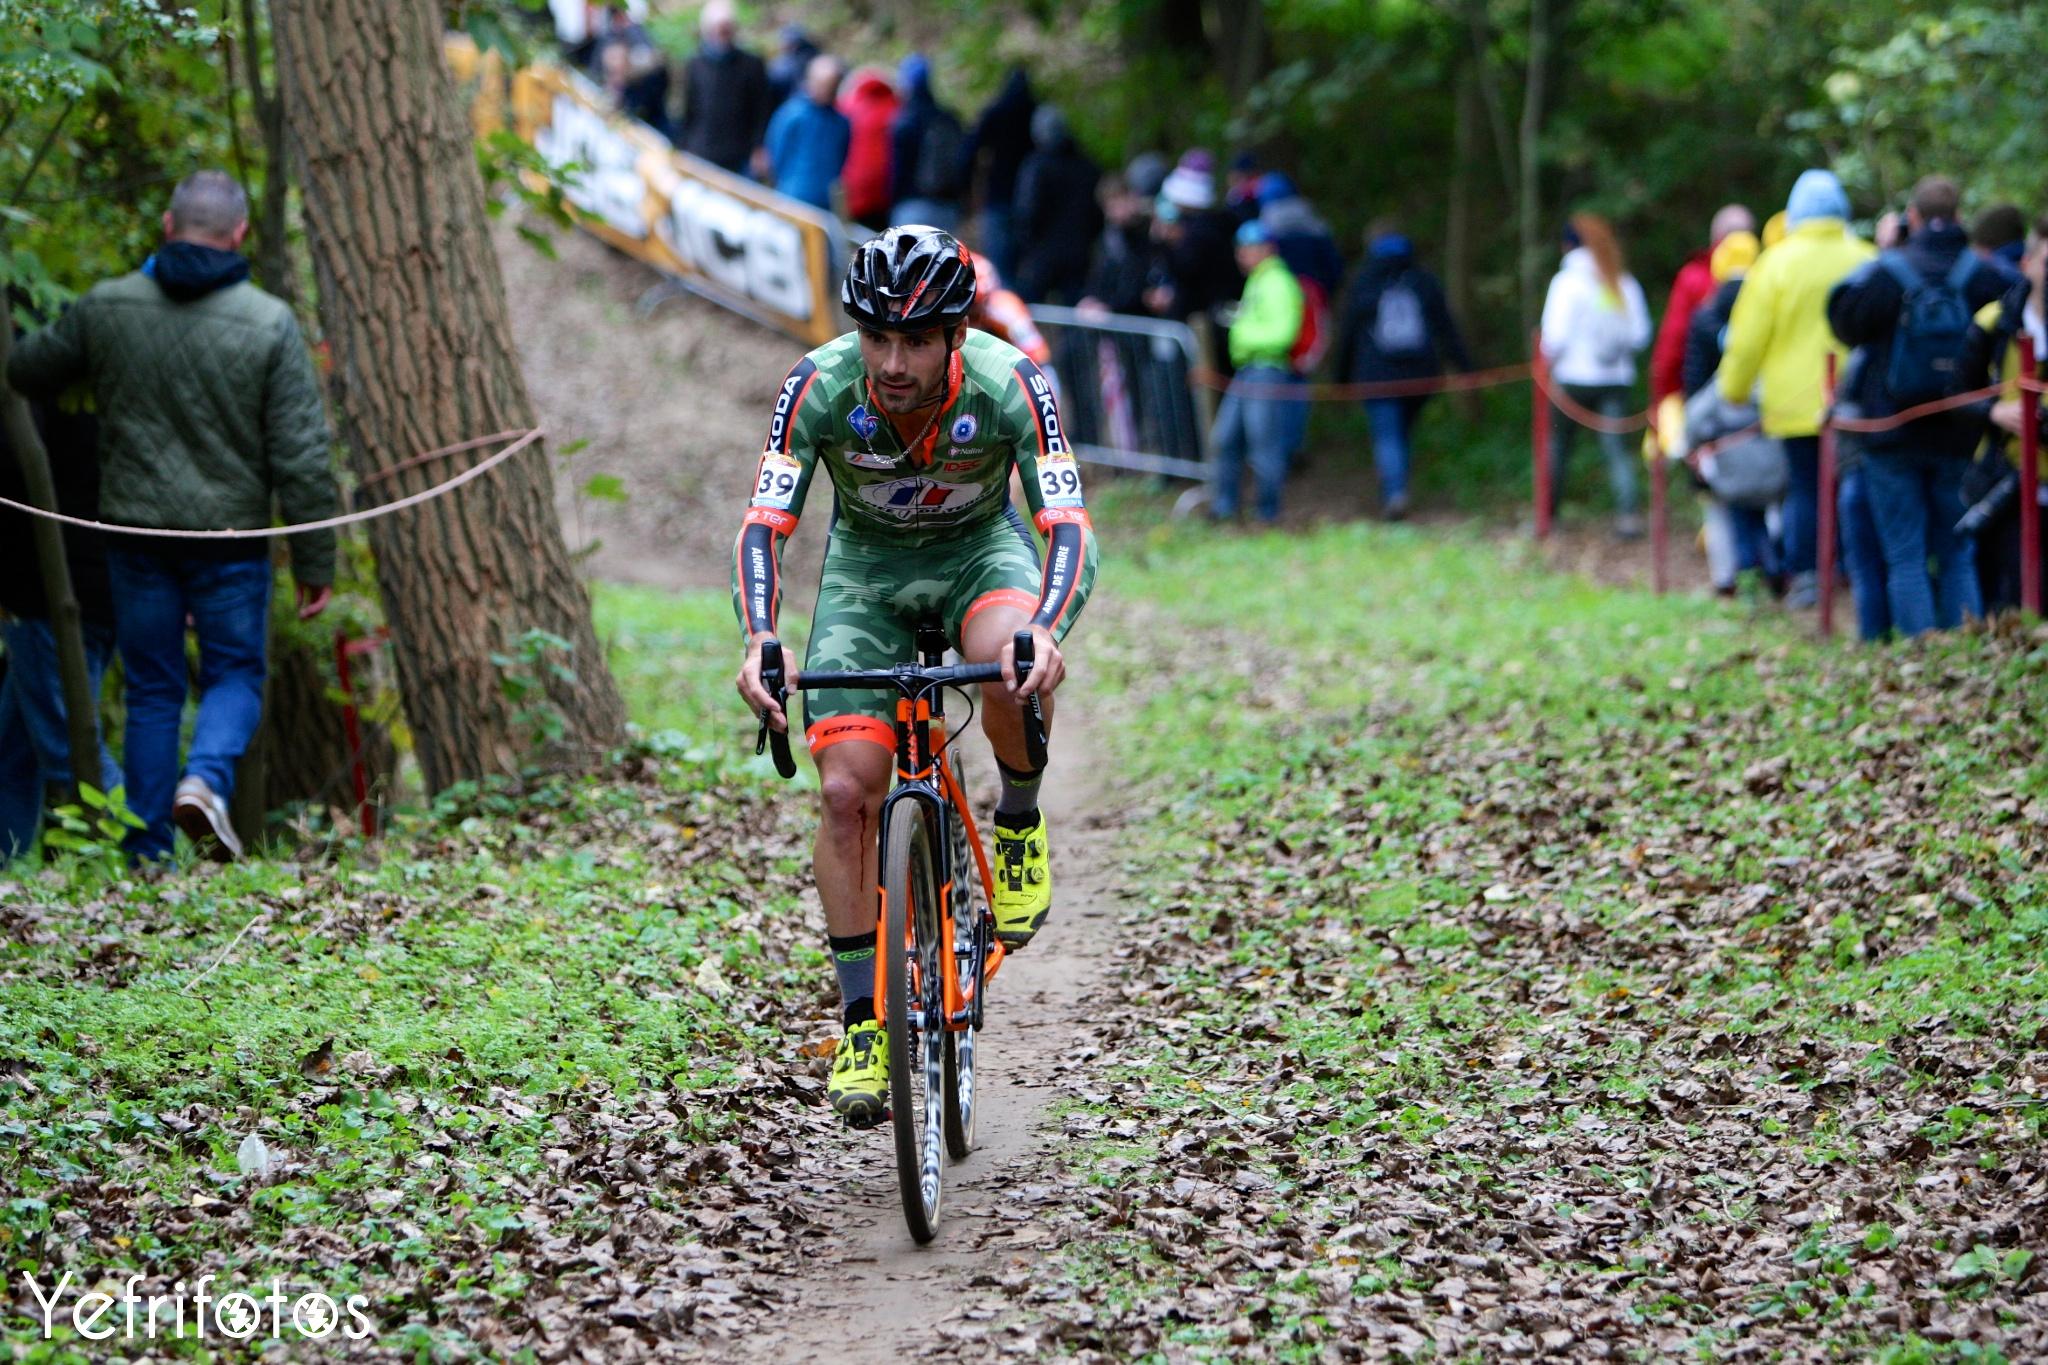 Koksijde - UCI Cyclocross World Cup - Fabien Canal